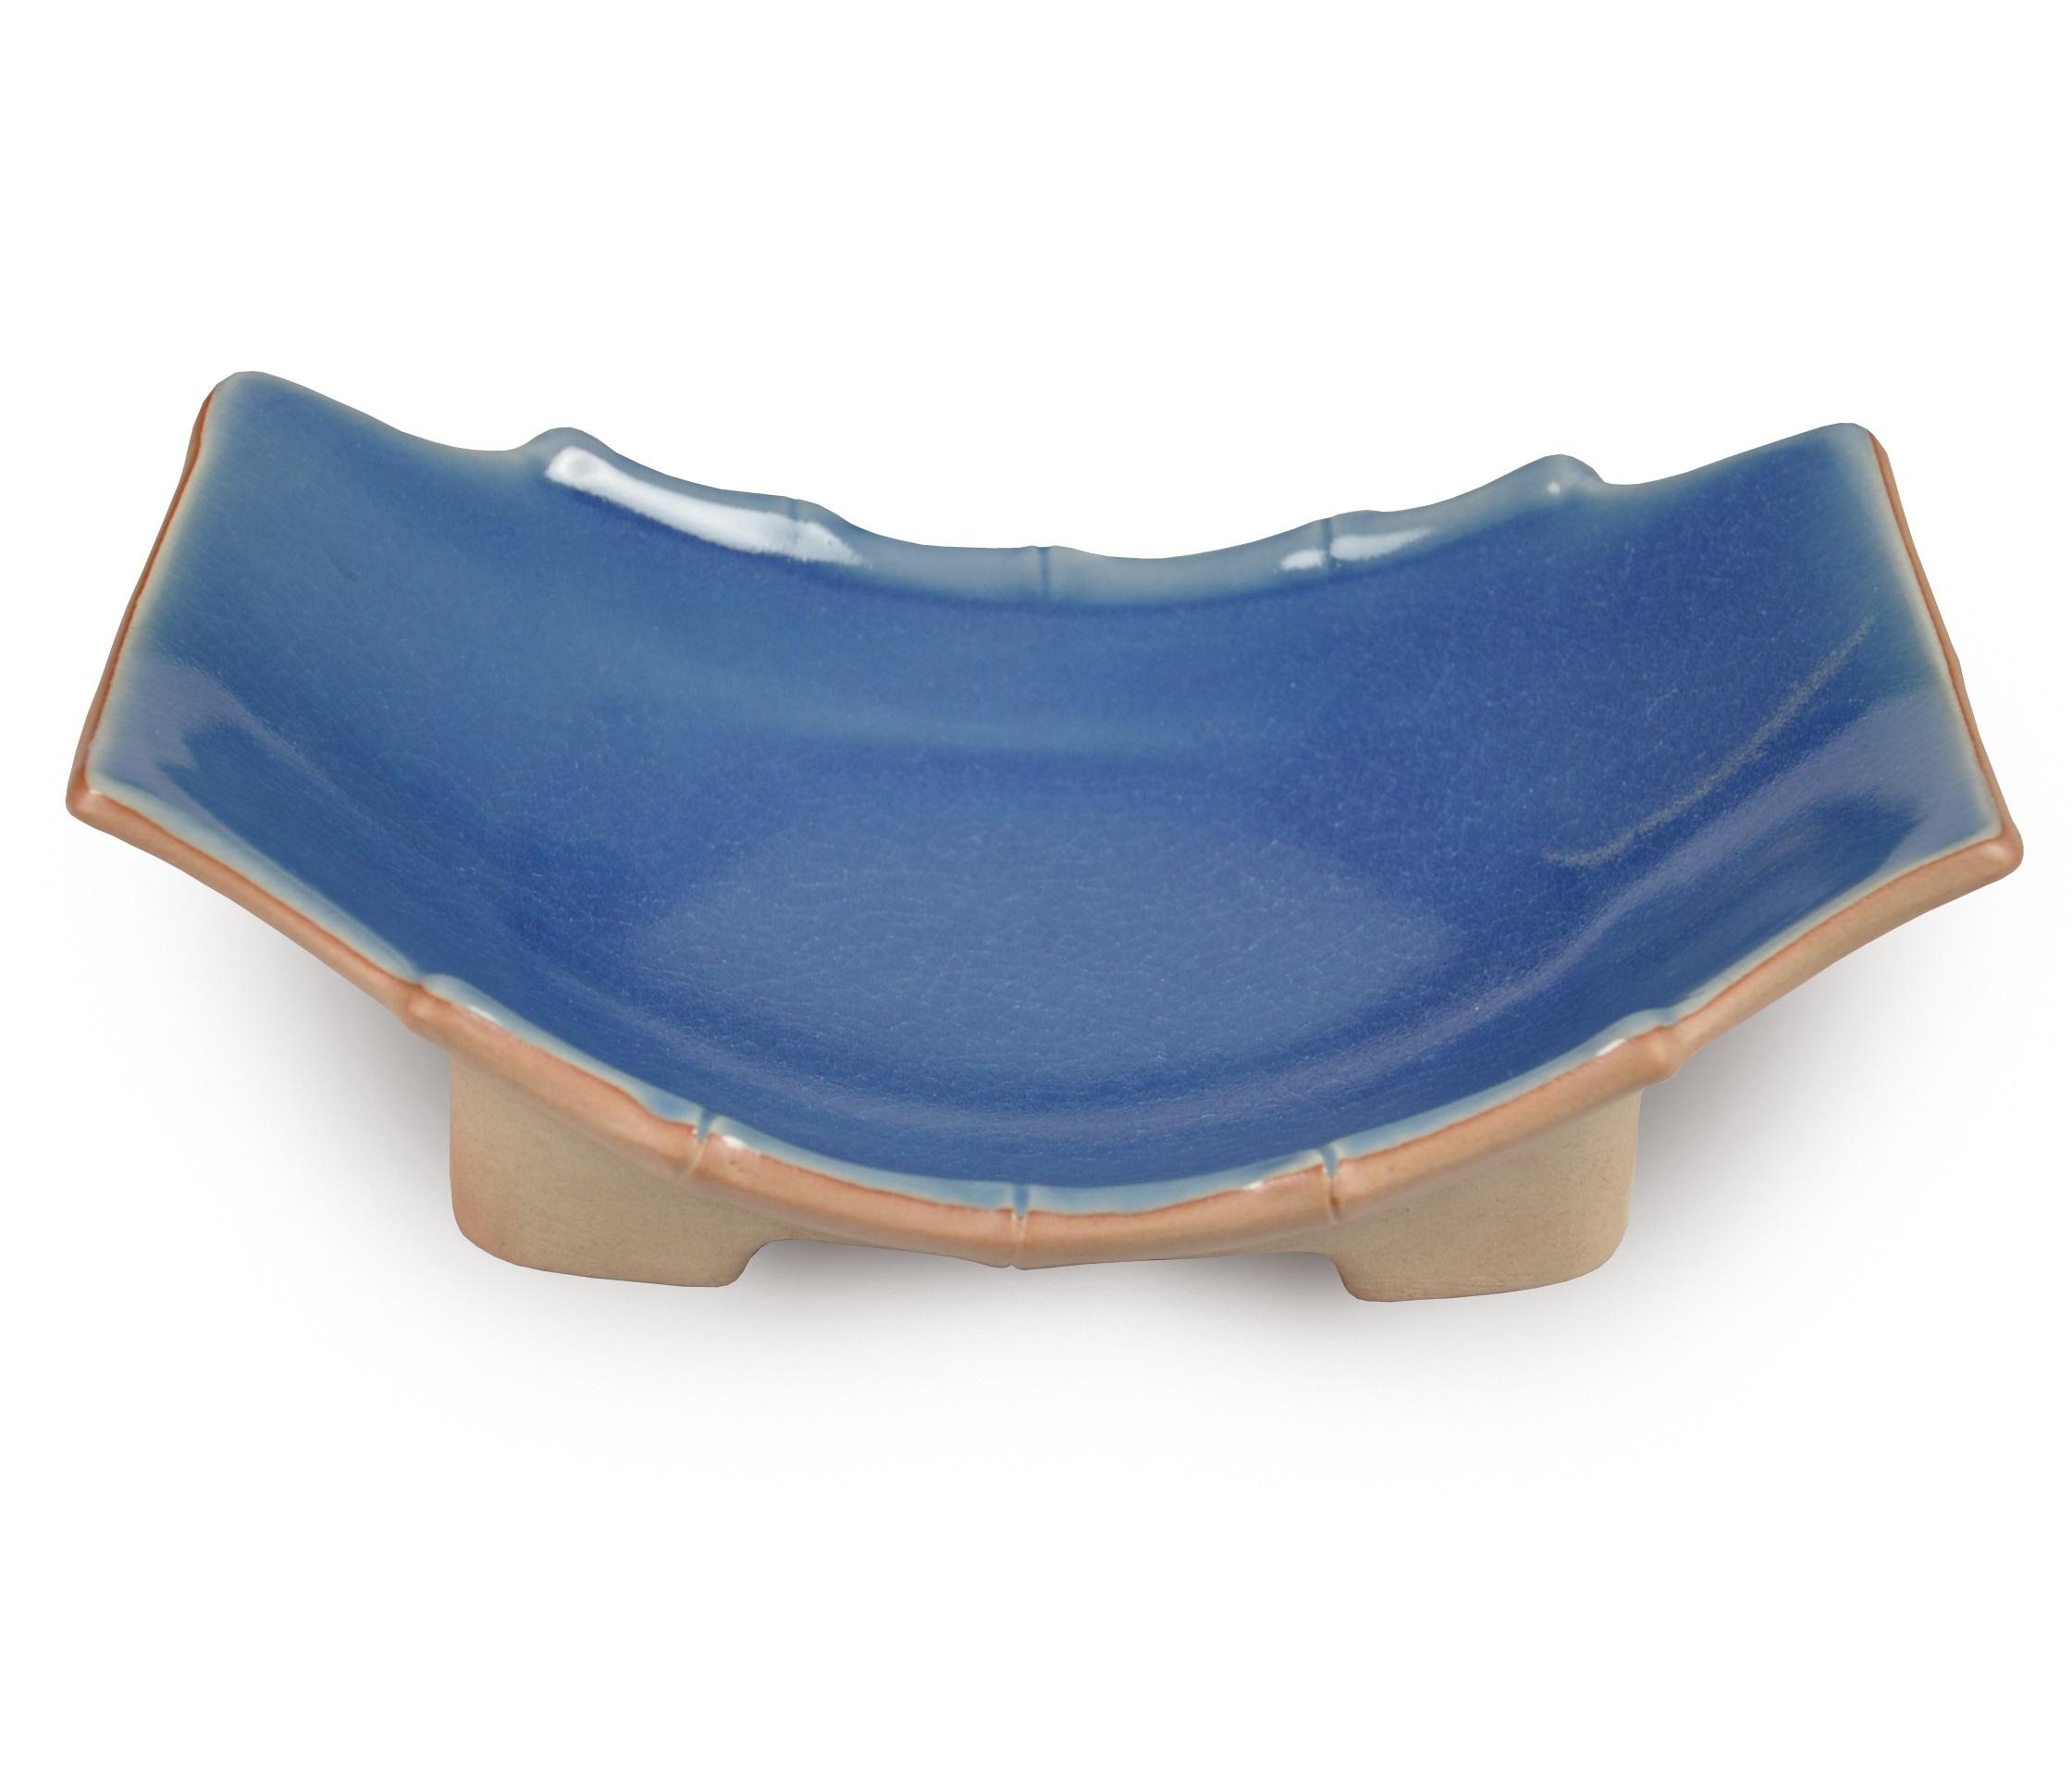 Блюдо на ножках Bamboo LineДекоративные блюда<br><br><br>Material: Керамика<br>Length см: 23<br>Width см: 17<br>Height см: 6.5